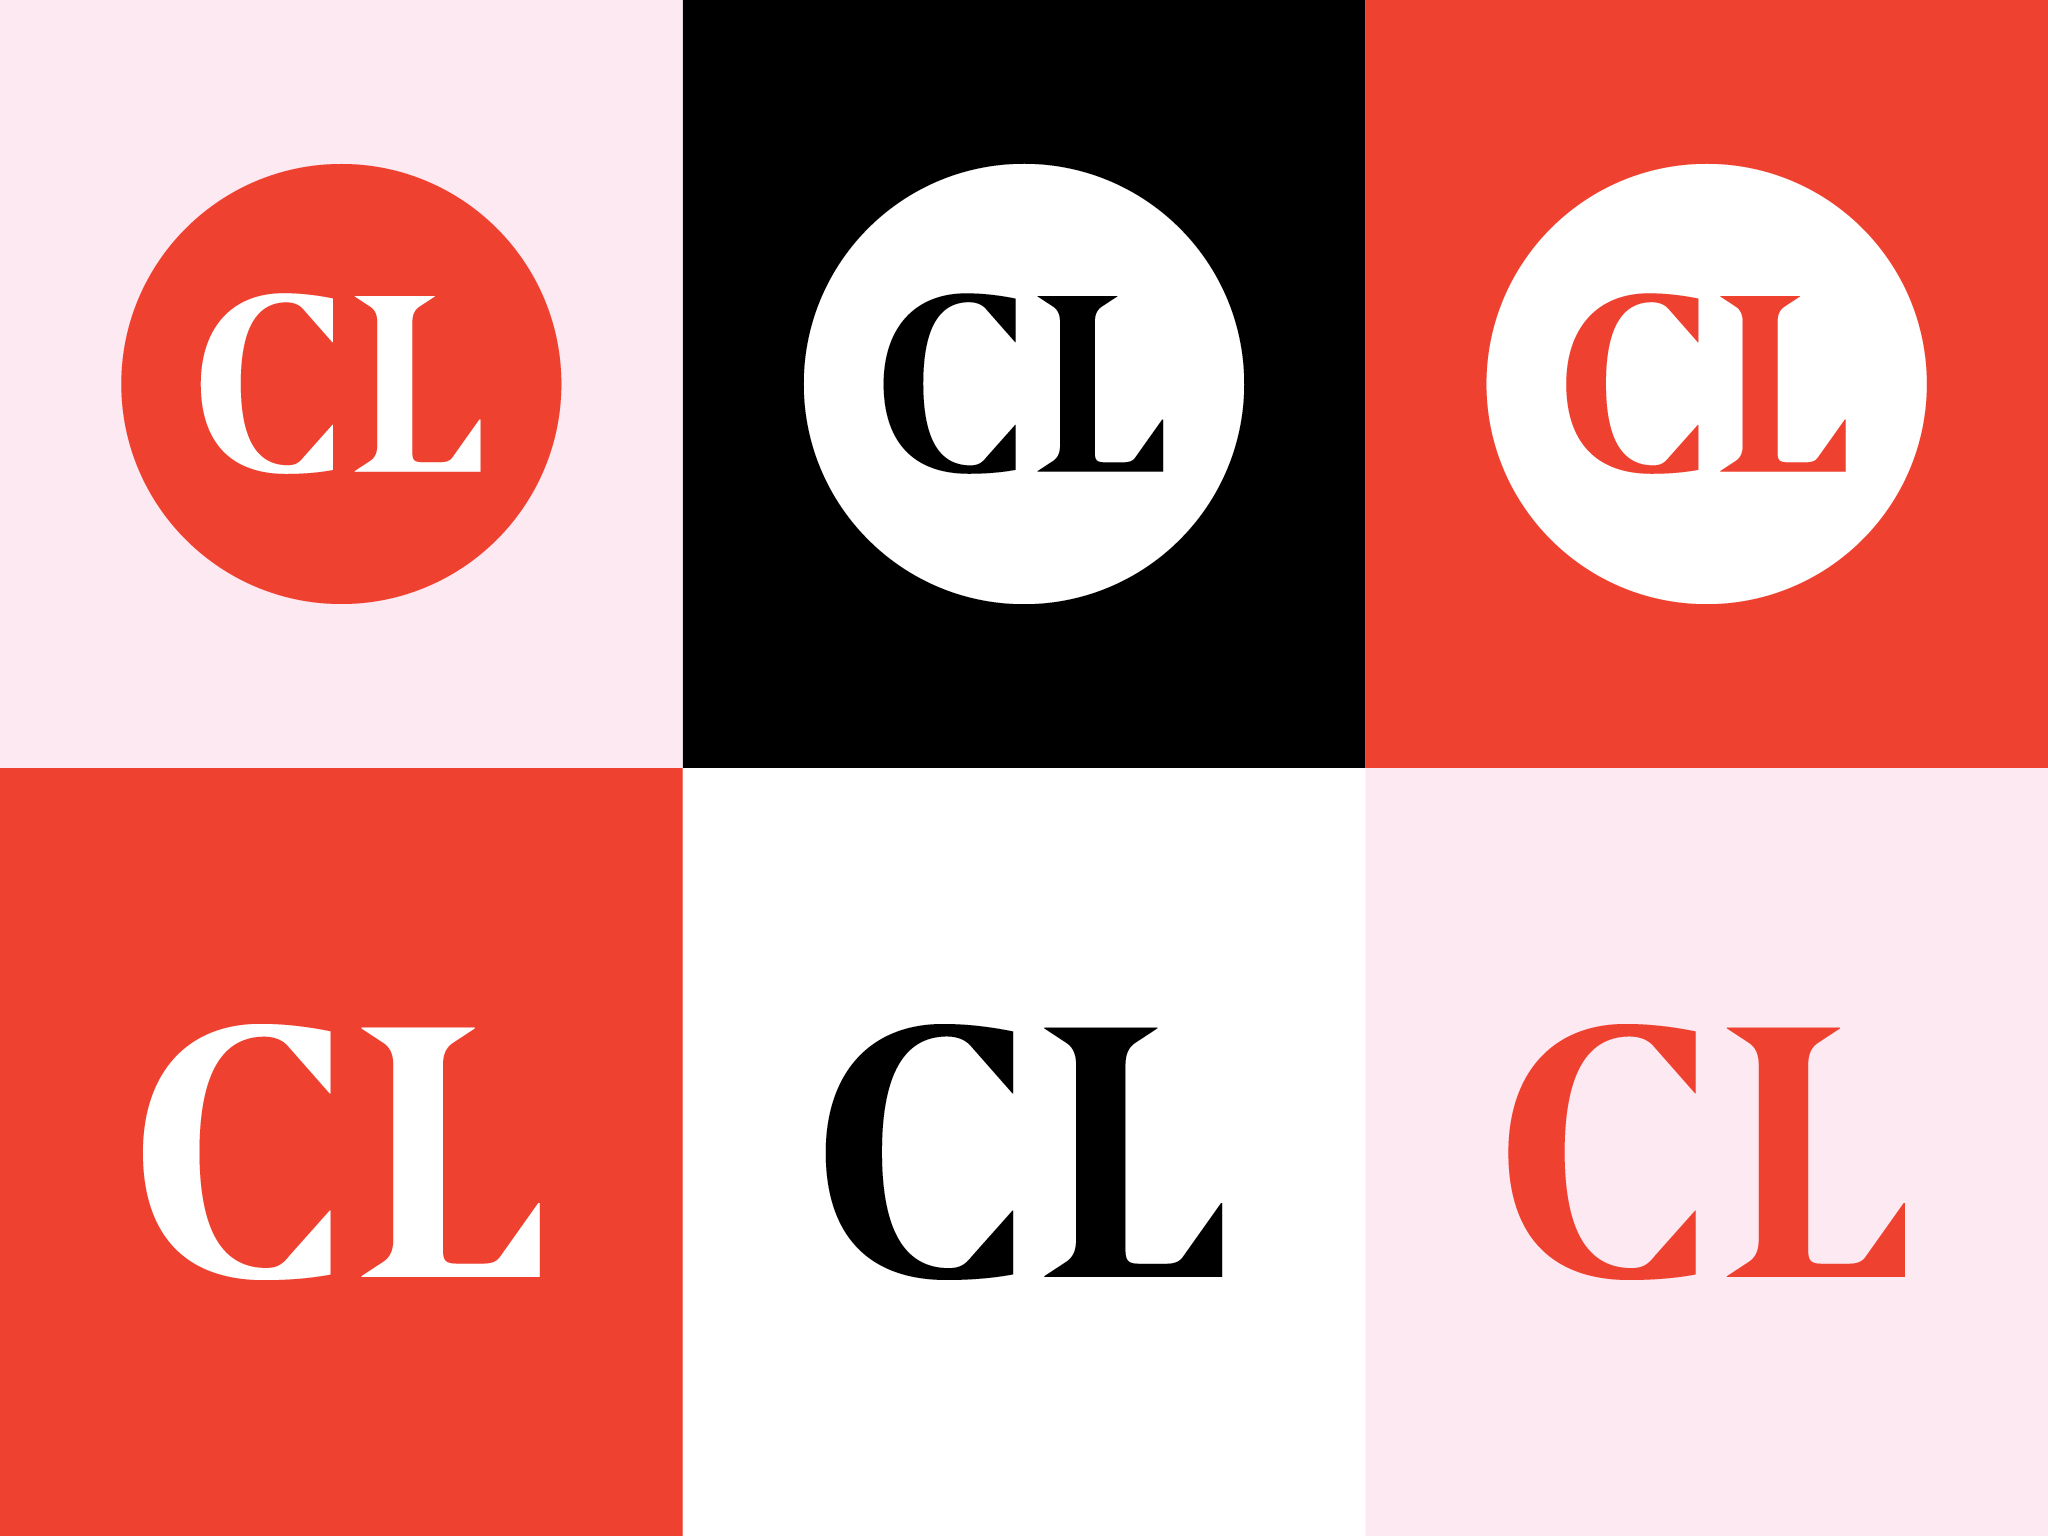 CL_CaseStudy_(4)_KB_3.jpg